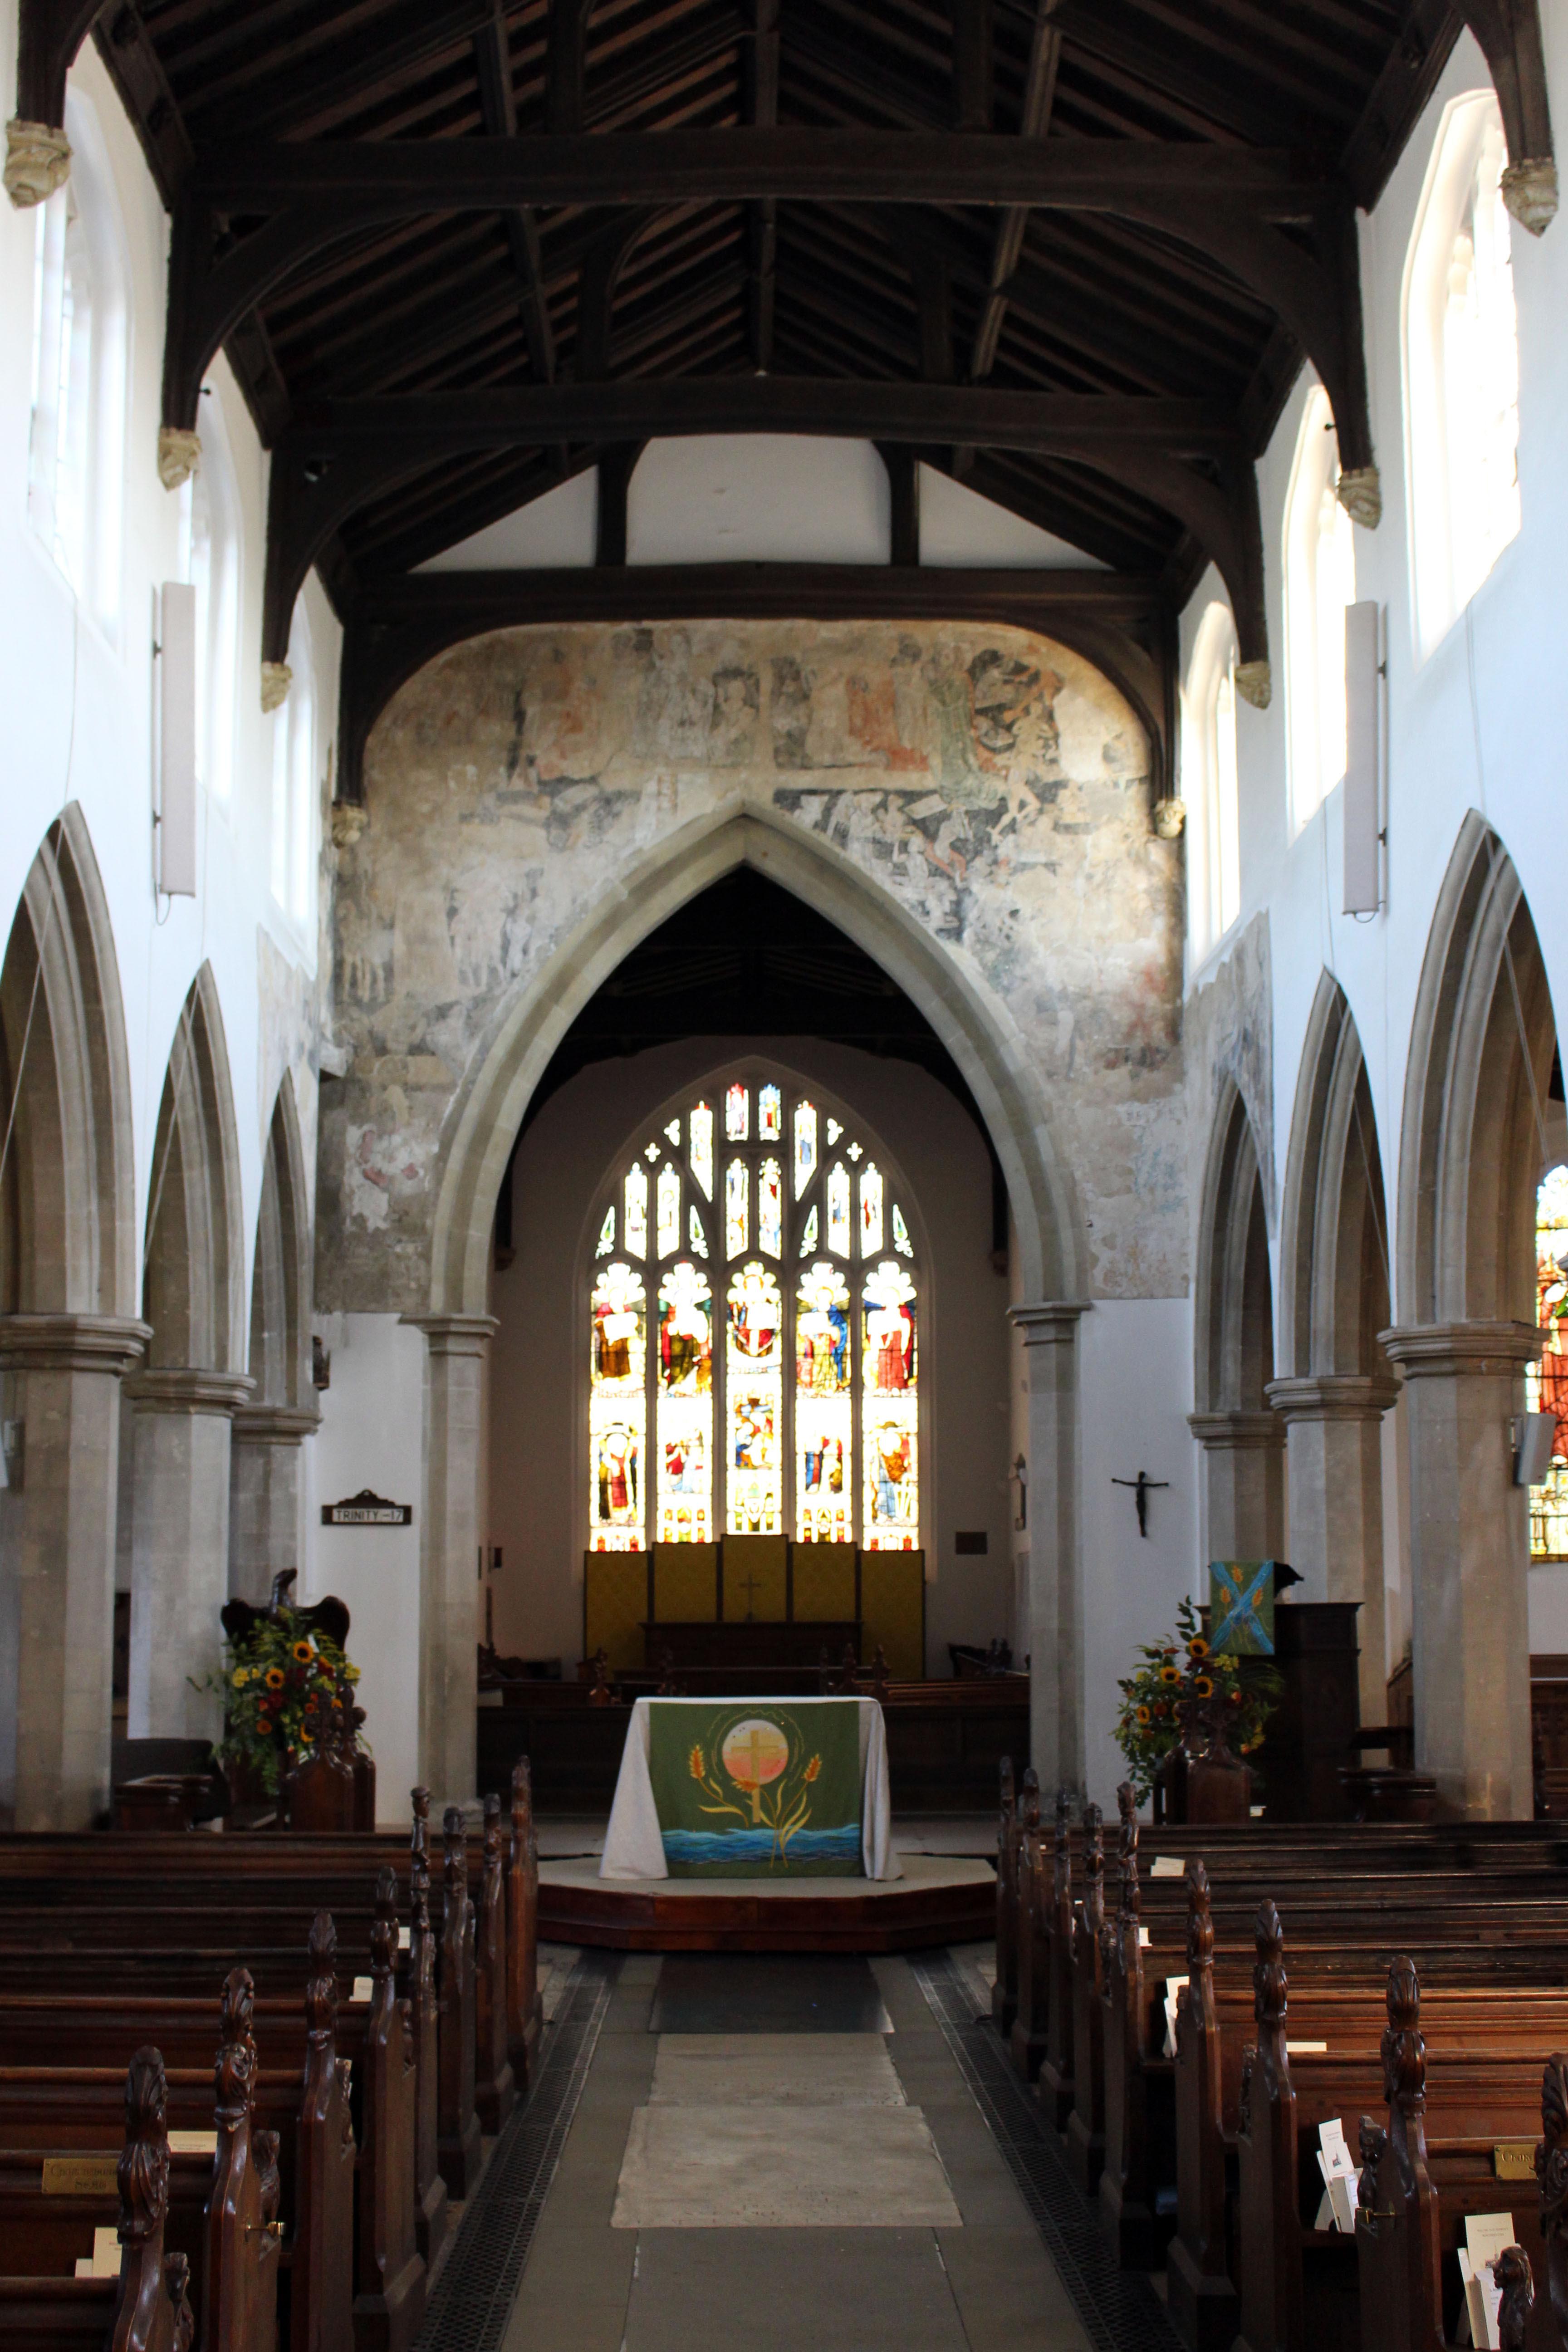 Filest Andrews Church Chesterton Cambridge 10 Jpg